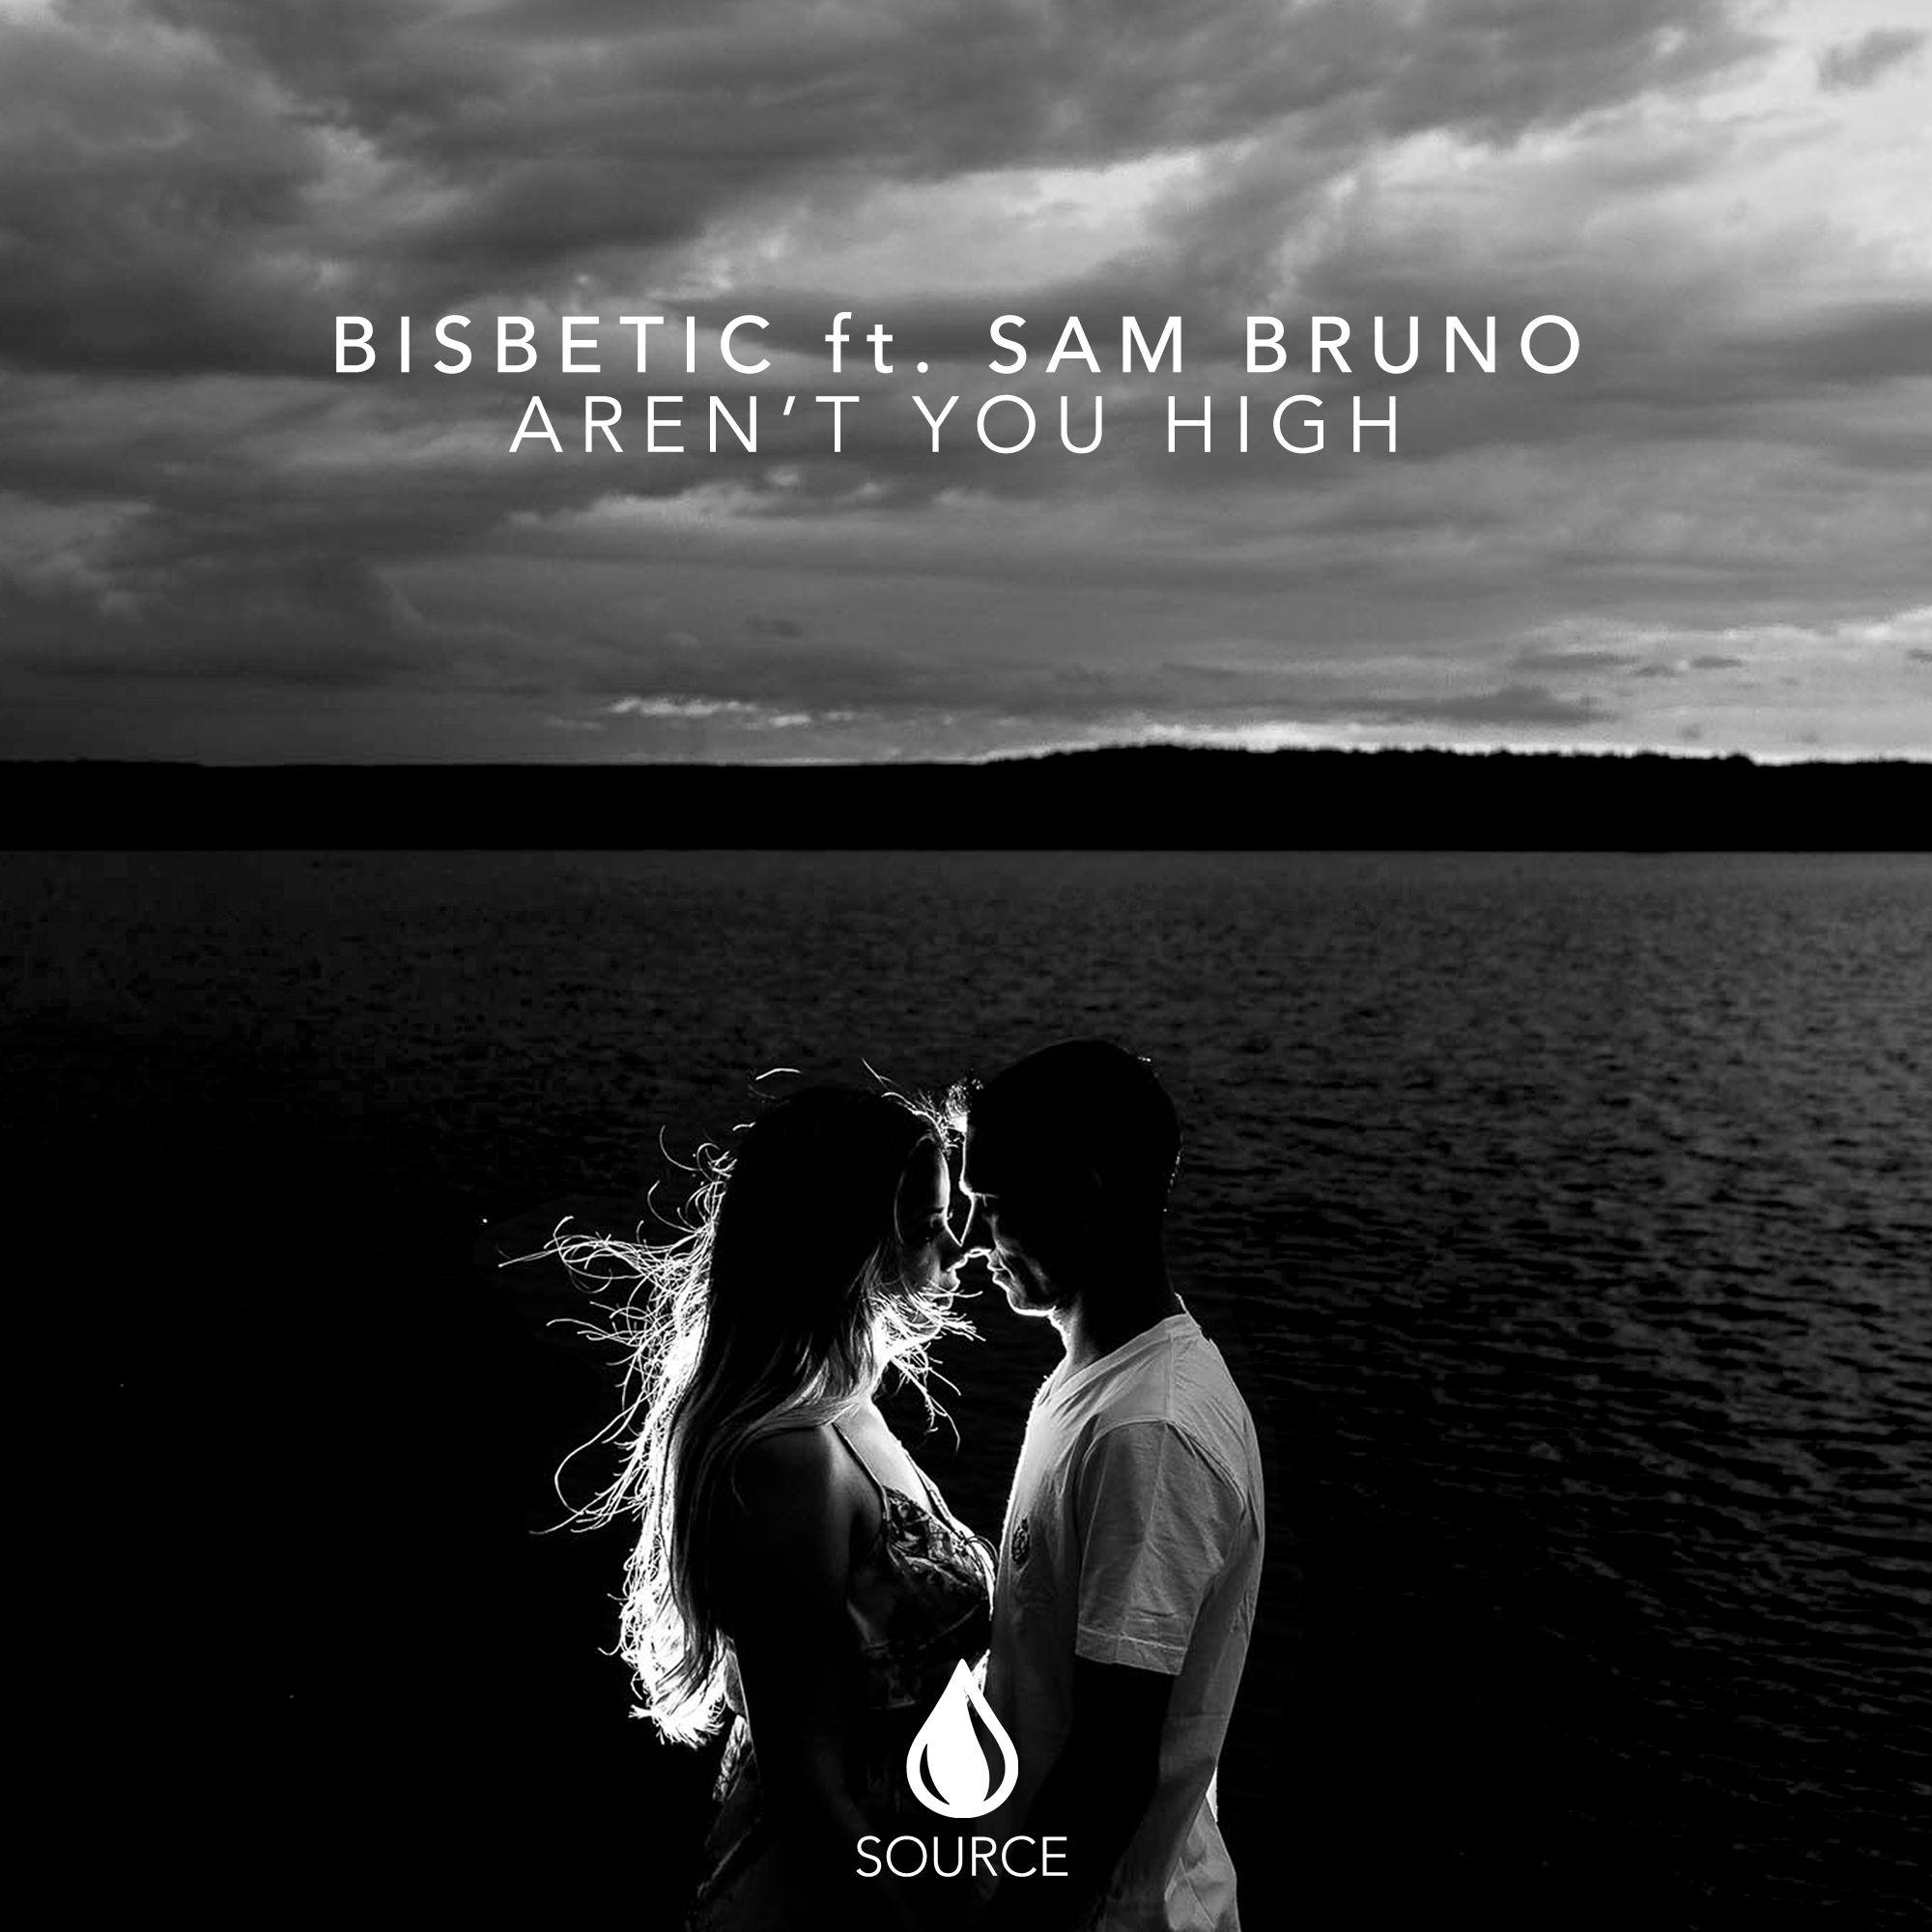 source_bisbetic_ft_sam_bruno_-_arent_you_high.jpg